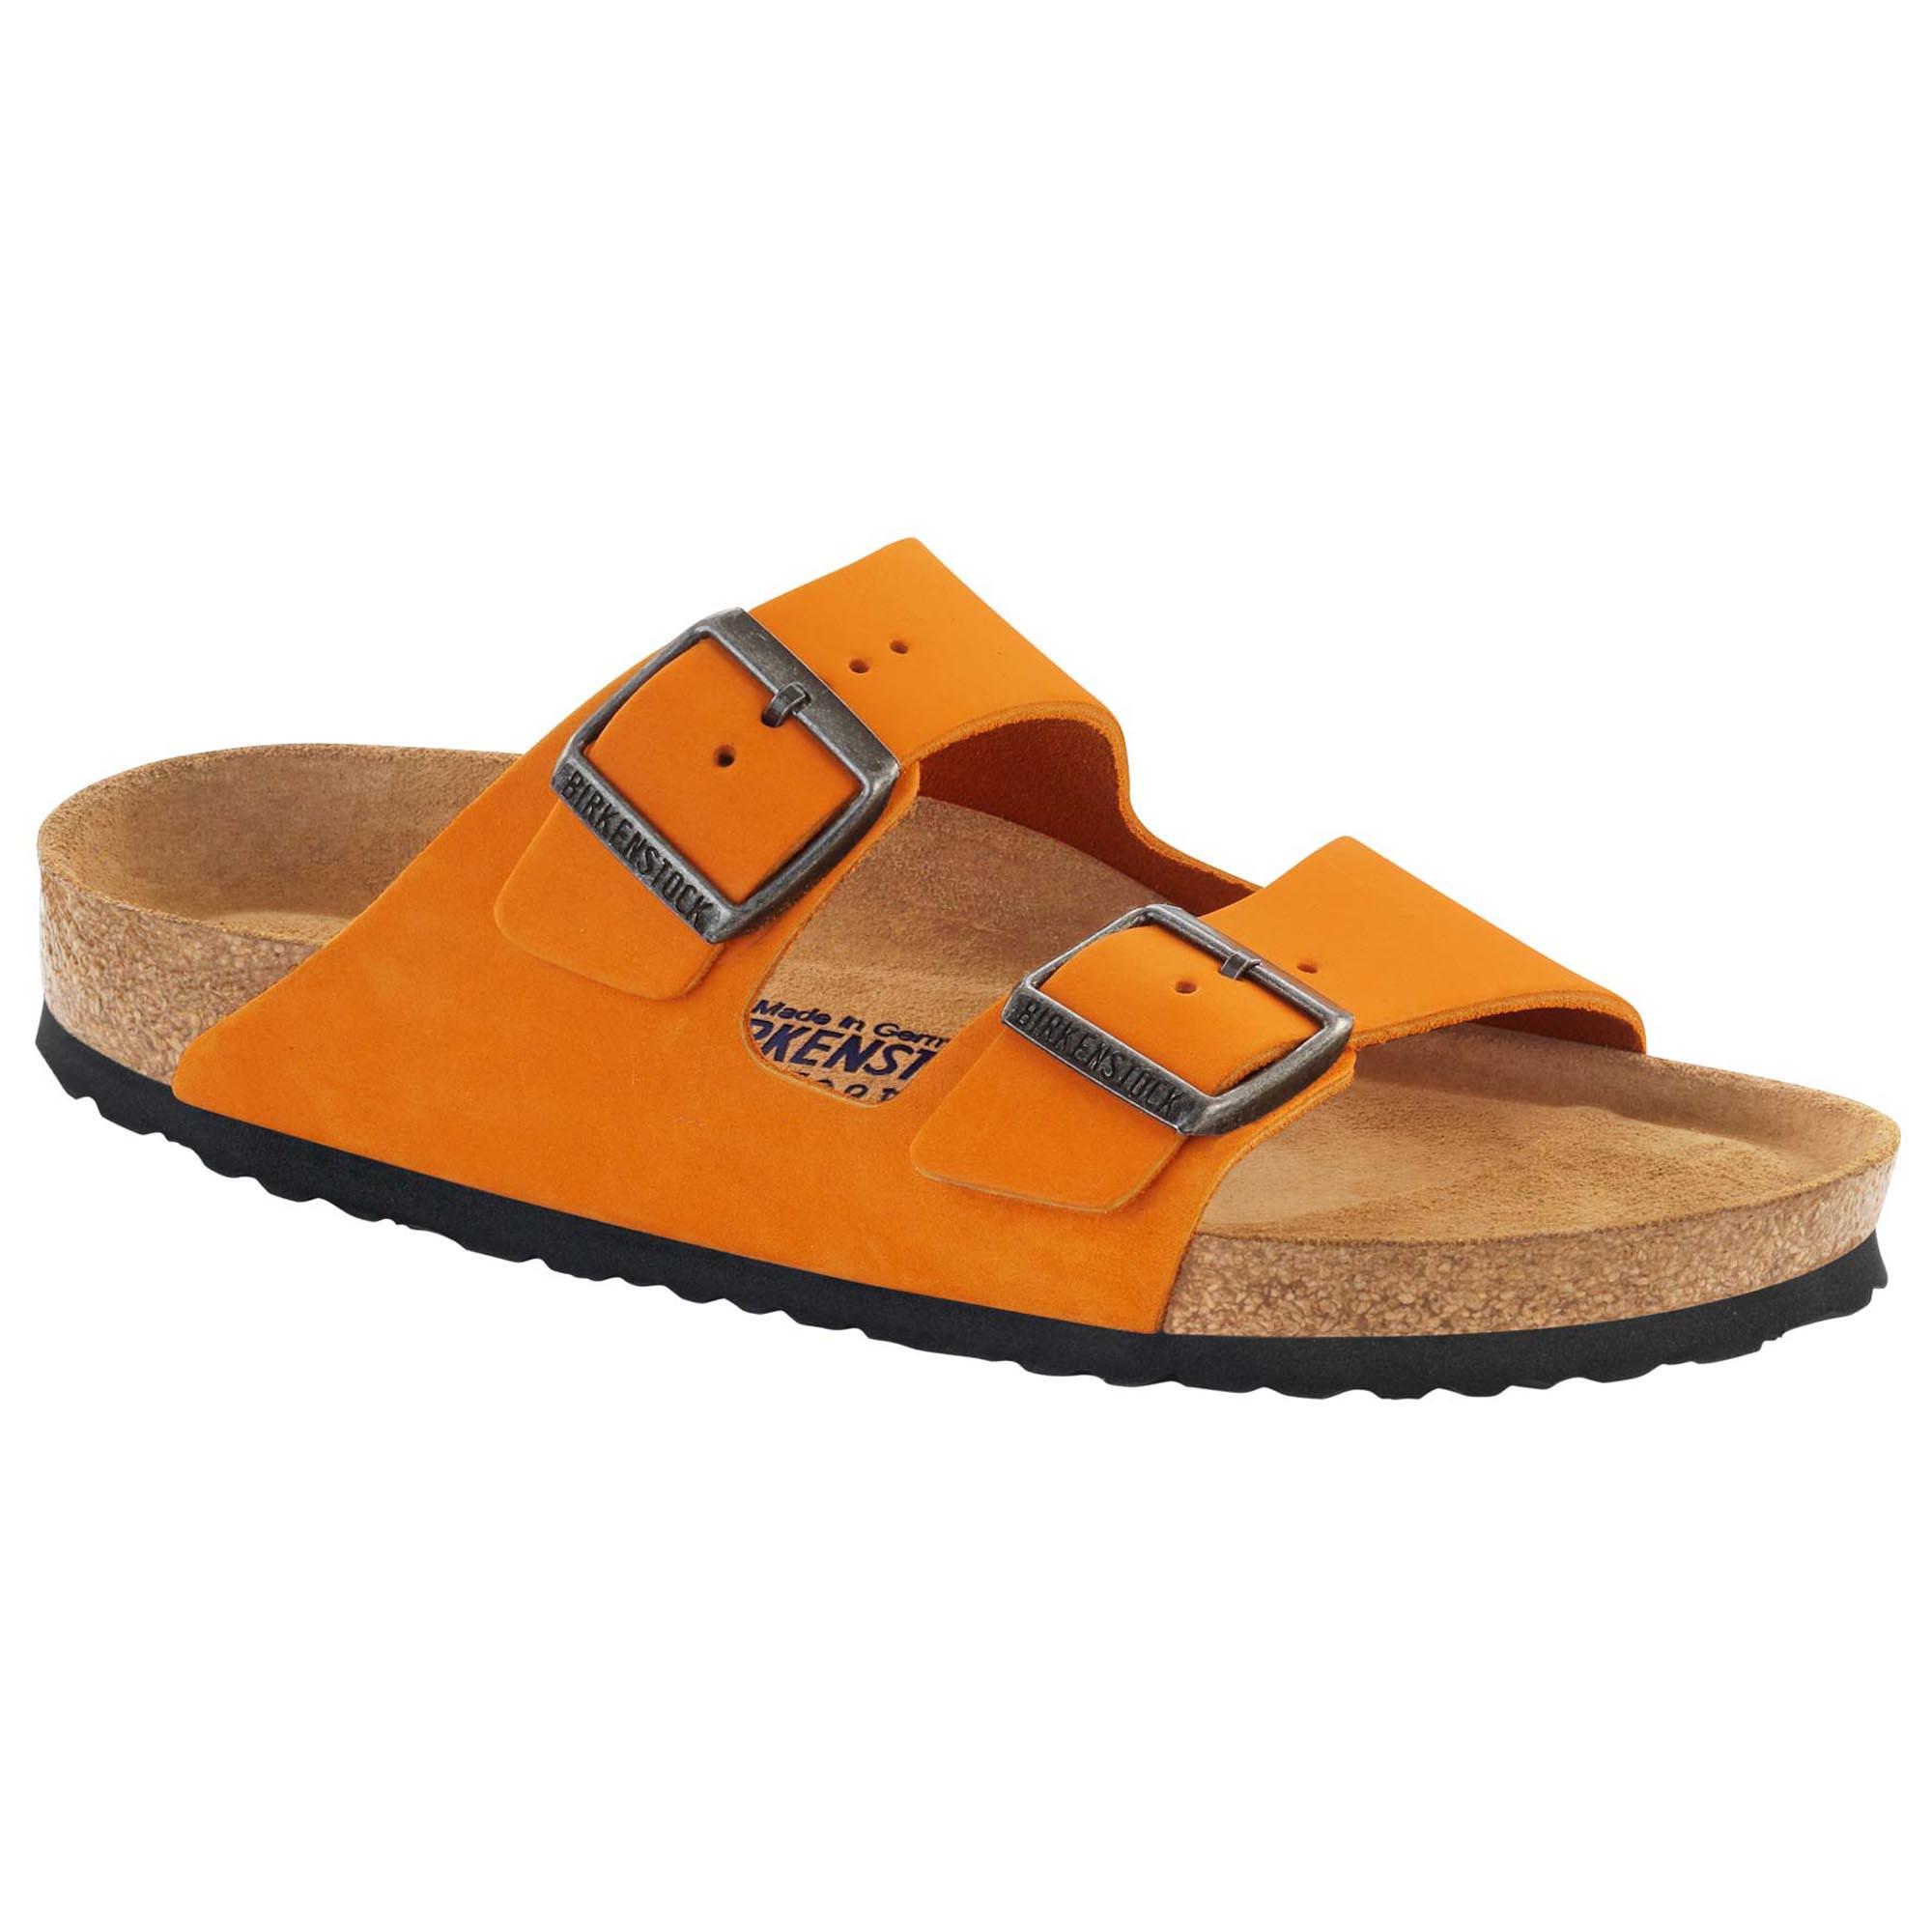 33917491a Arizona Nubuck Leather Orange | shop online at BIRKENSTOCK